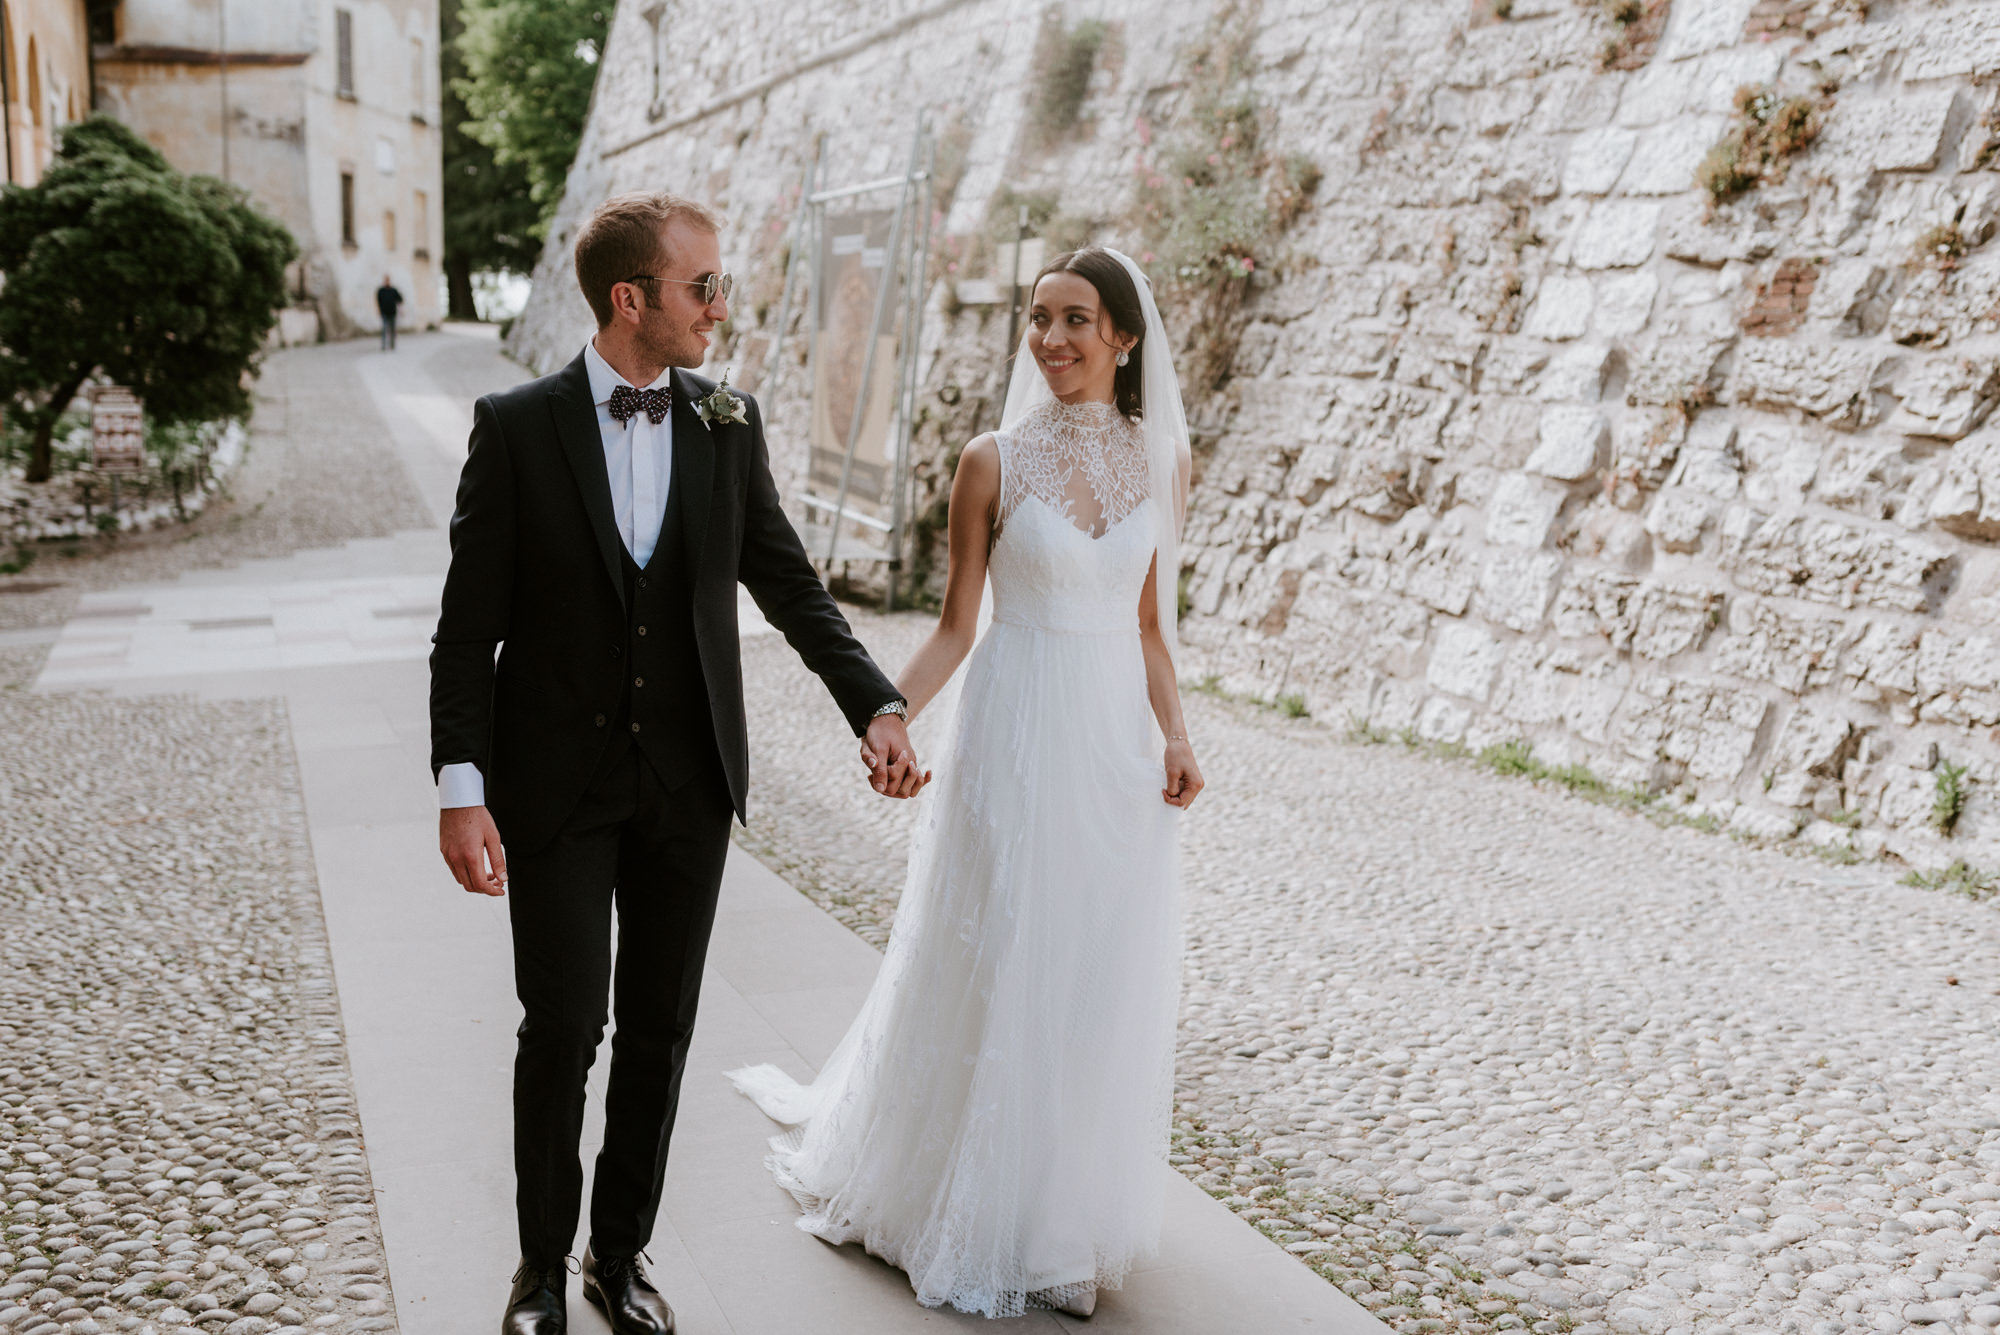 FOTO+PHOTO+BODA+WEDDING+ITALIA+ITALY+MAURICIO+GARAY+MAURICIOGARAY+WEDDINPHOTOGRAPHER+FOTOGRAFODEBODA-1166.jpg